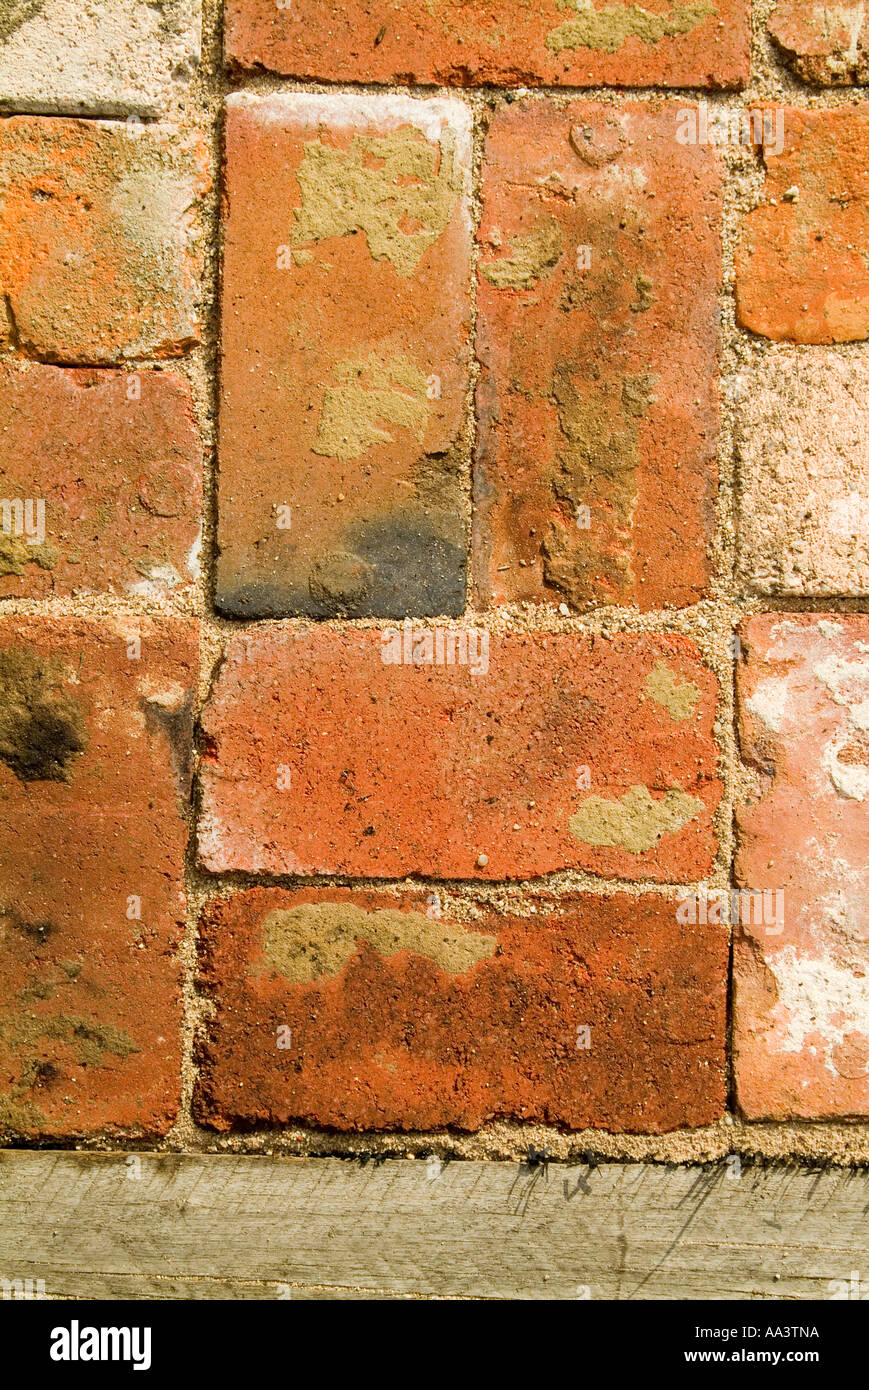 Basket weave brick pattern - Recycled Bricks Laid In A Basketweave Pattern In Coarse Sand As Paving